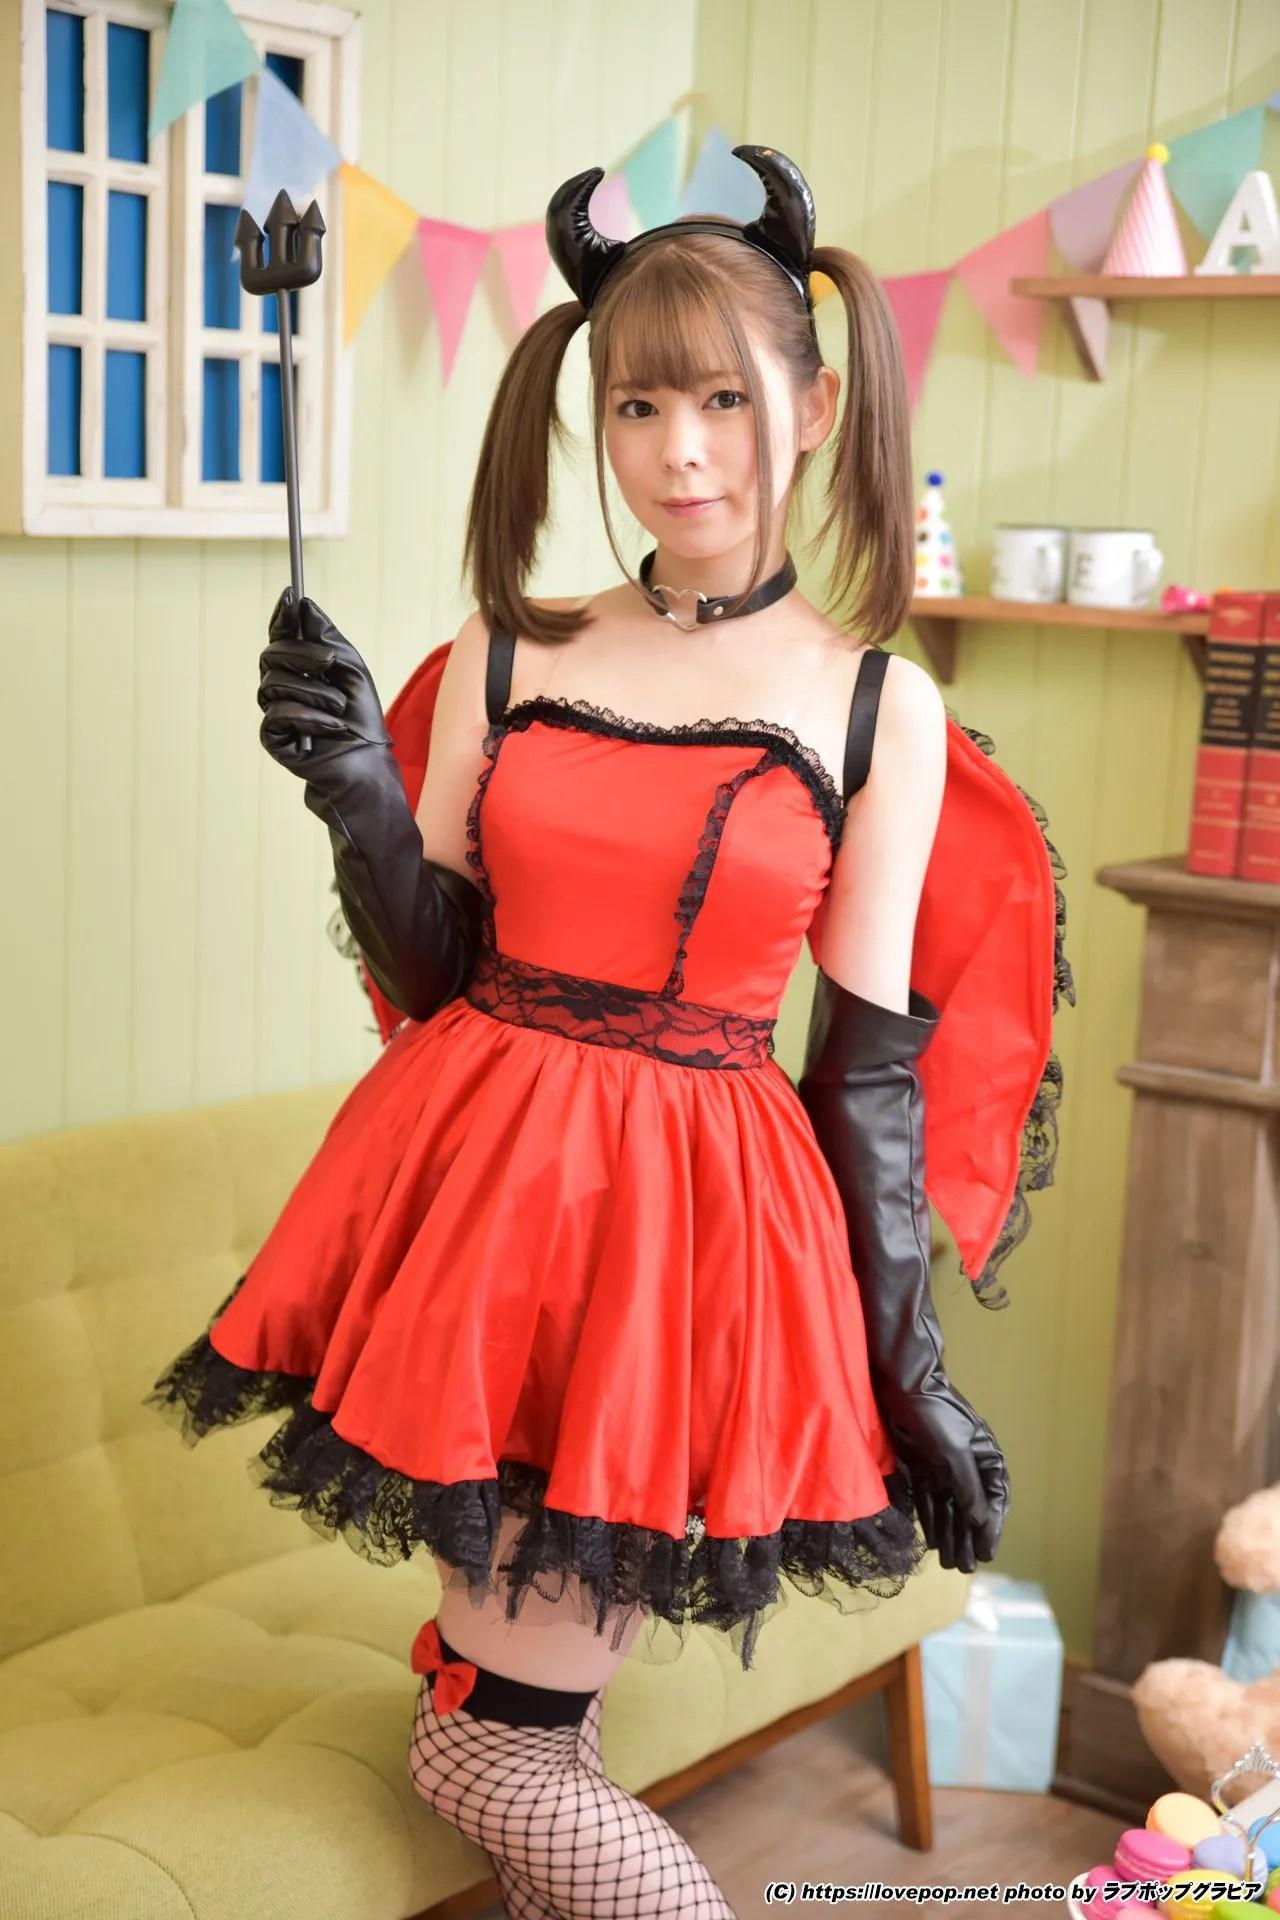 [LOVEPOP] Ren Aragaki 新垣恋 Photoset 01 写真集[55P]插图(1)